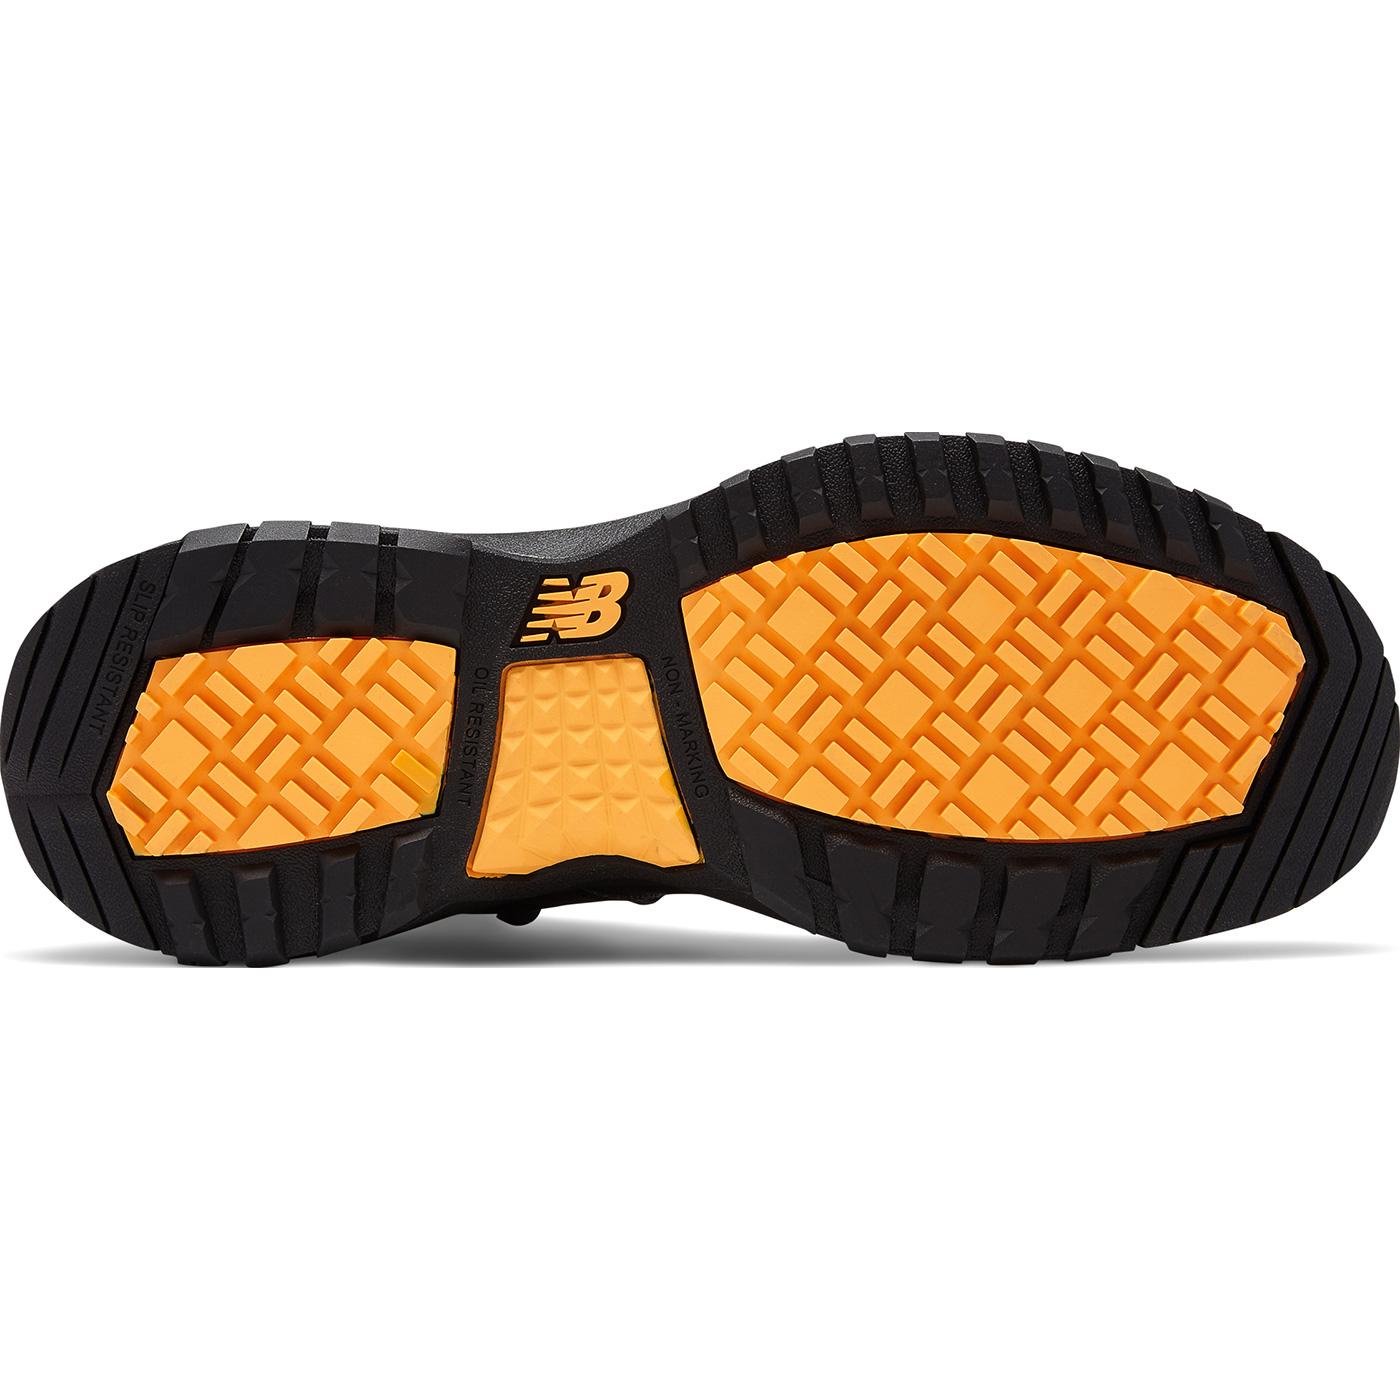 182547f122bee New Balance 989v1 Men's 6 inch Composite Toe Electrical Hazard Work Hiker